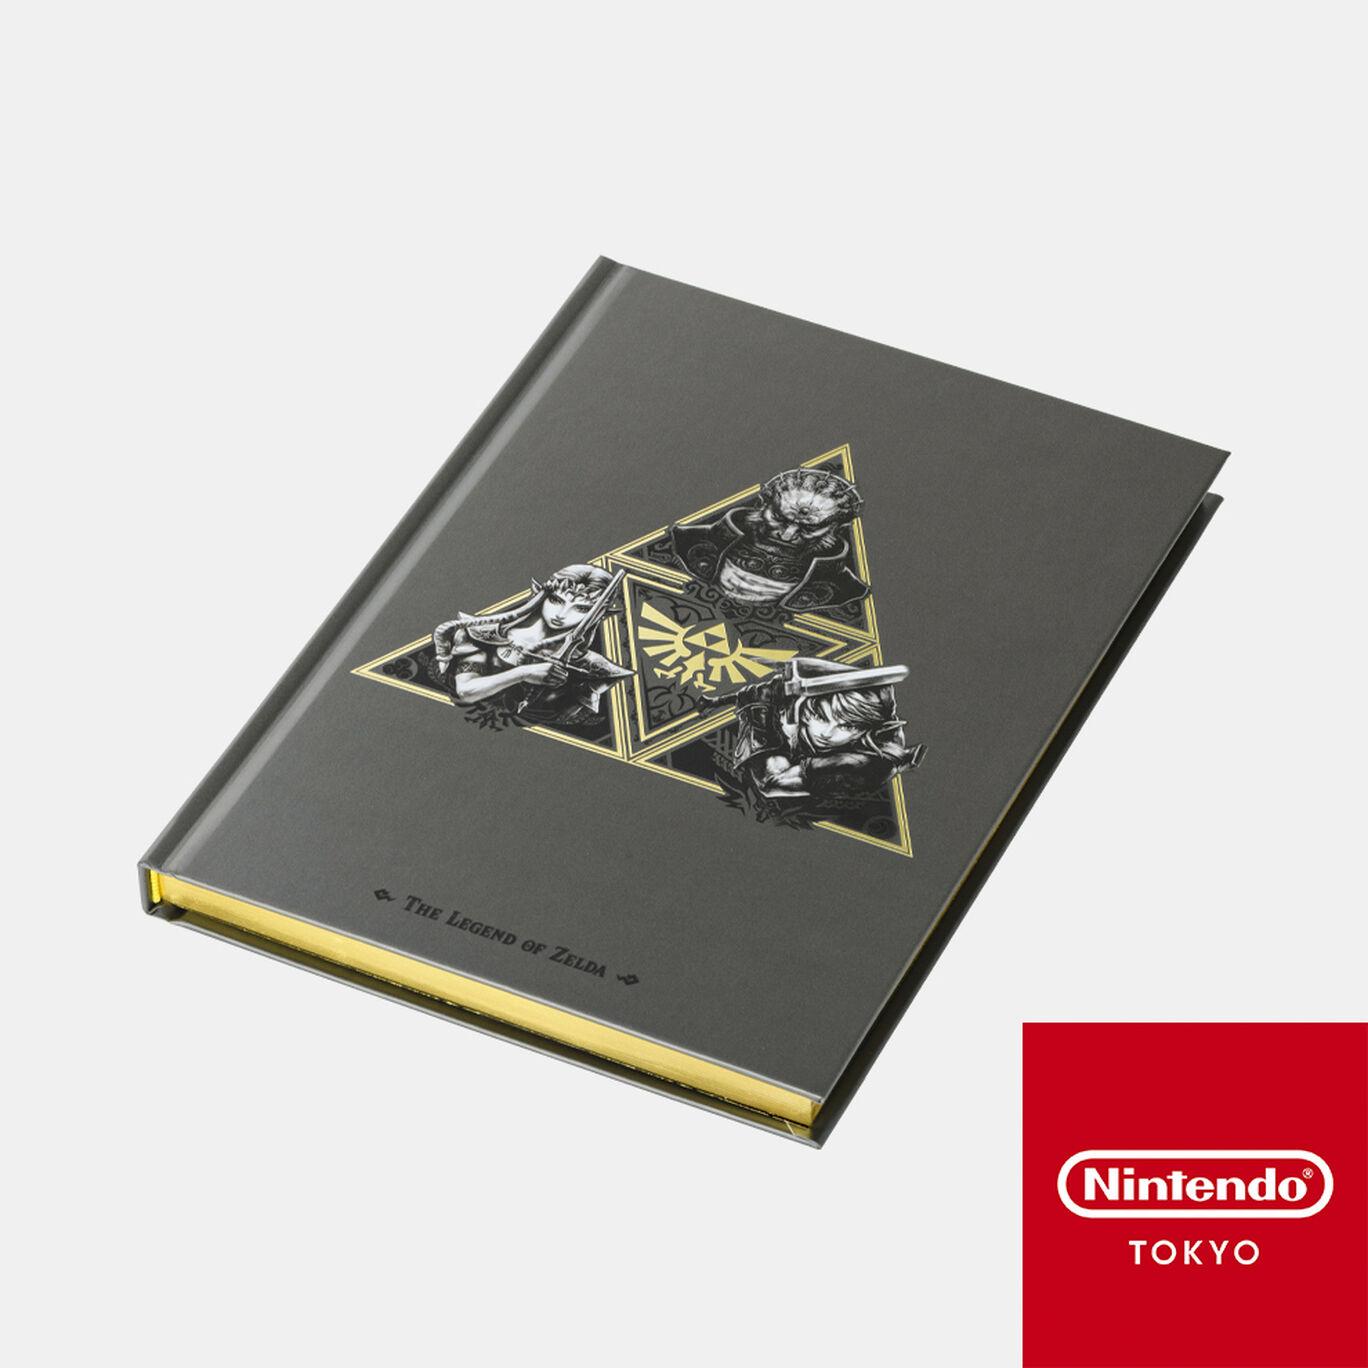 A5ハードカバーノート トライフォース ゼルダの伝説【Nintendo TOKYO取り扱い商品】